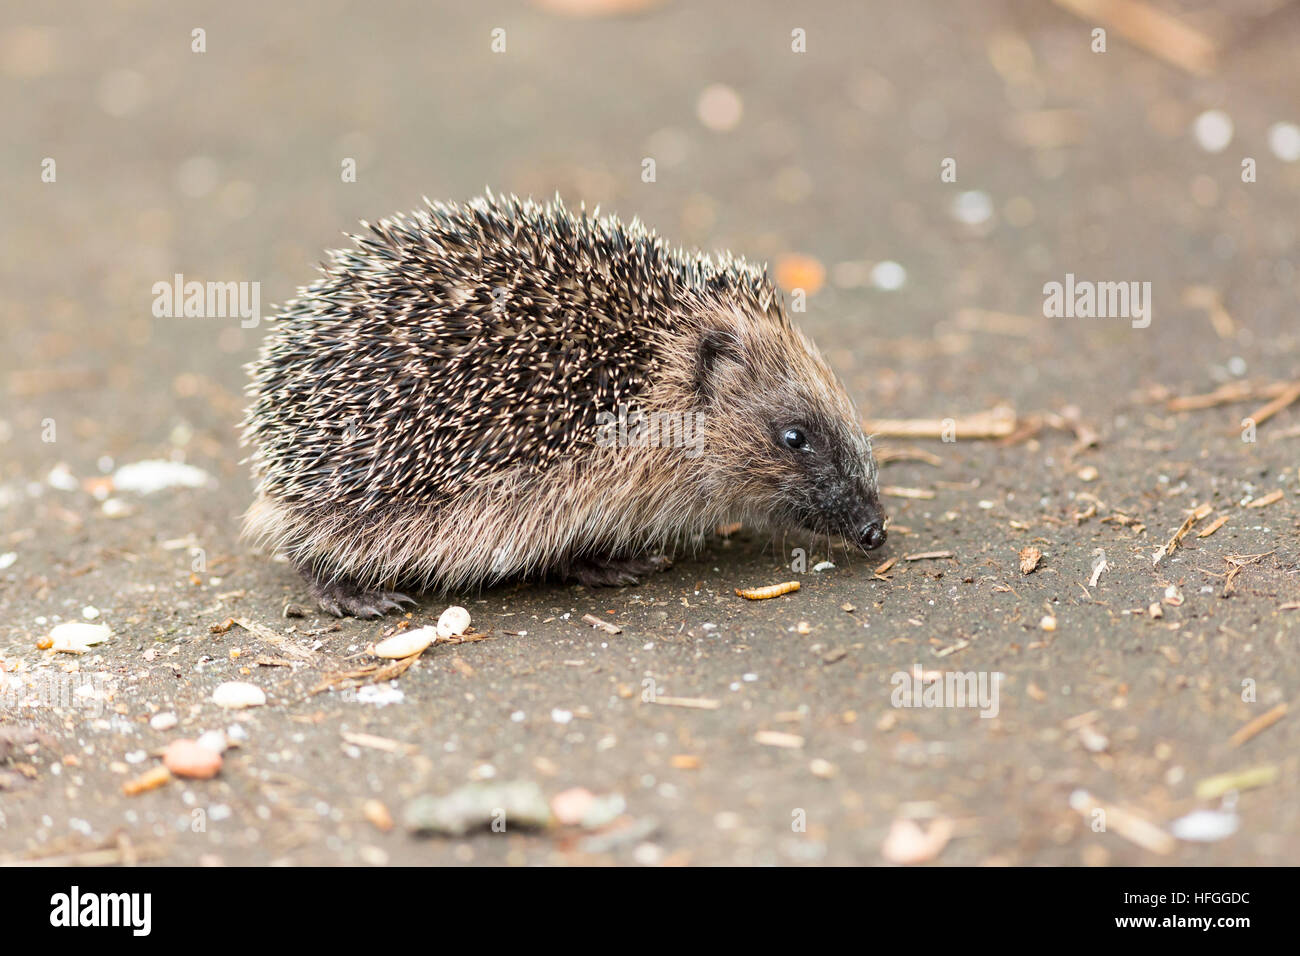 juvenile hedgehog eating bird food - Stock Image